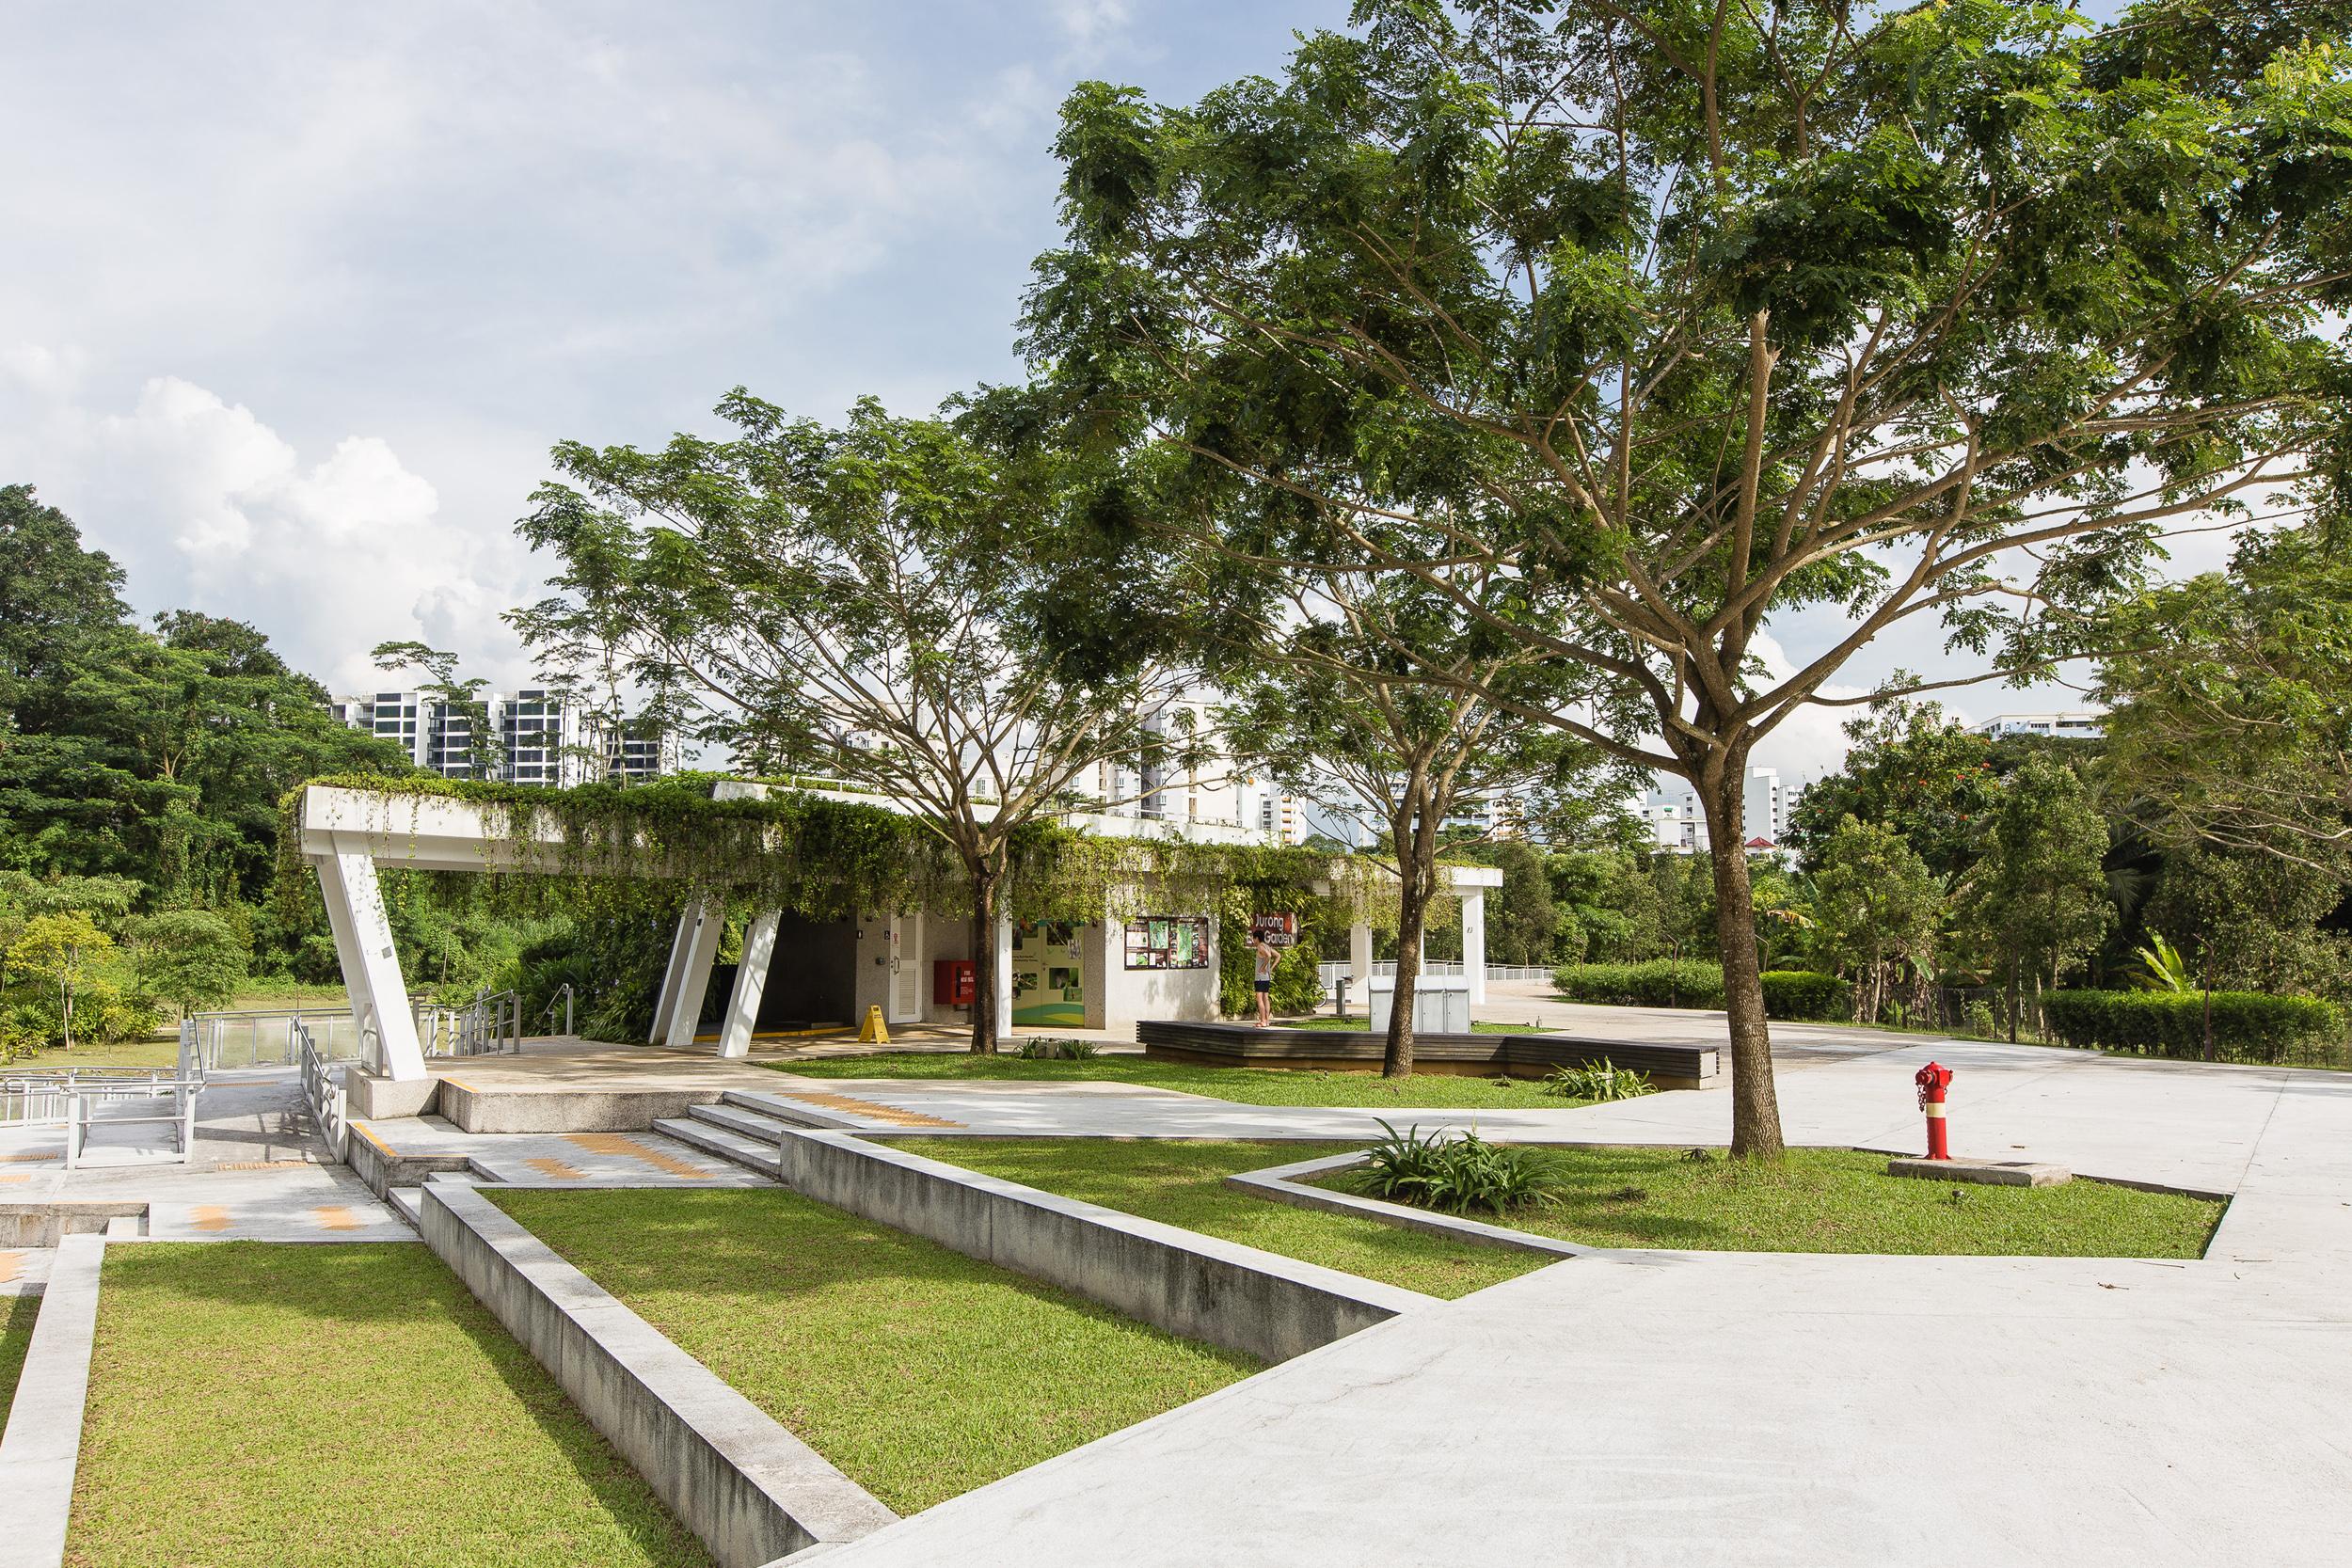 singapore-photographer-zainal-zainal-studio-mci-sme-towkay-03.jpg